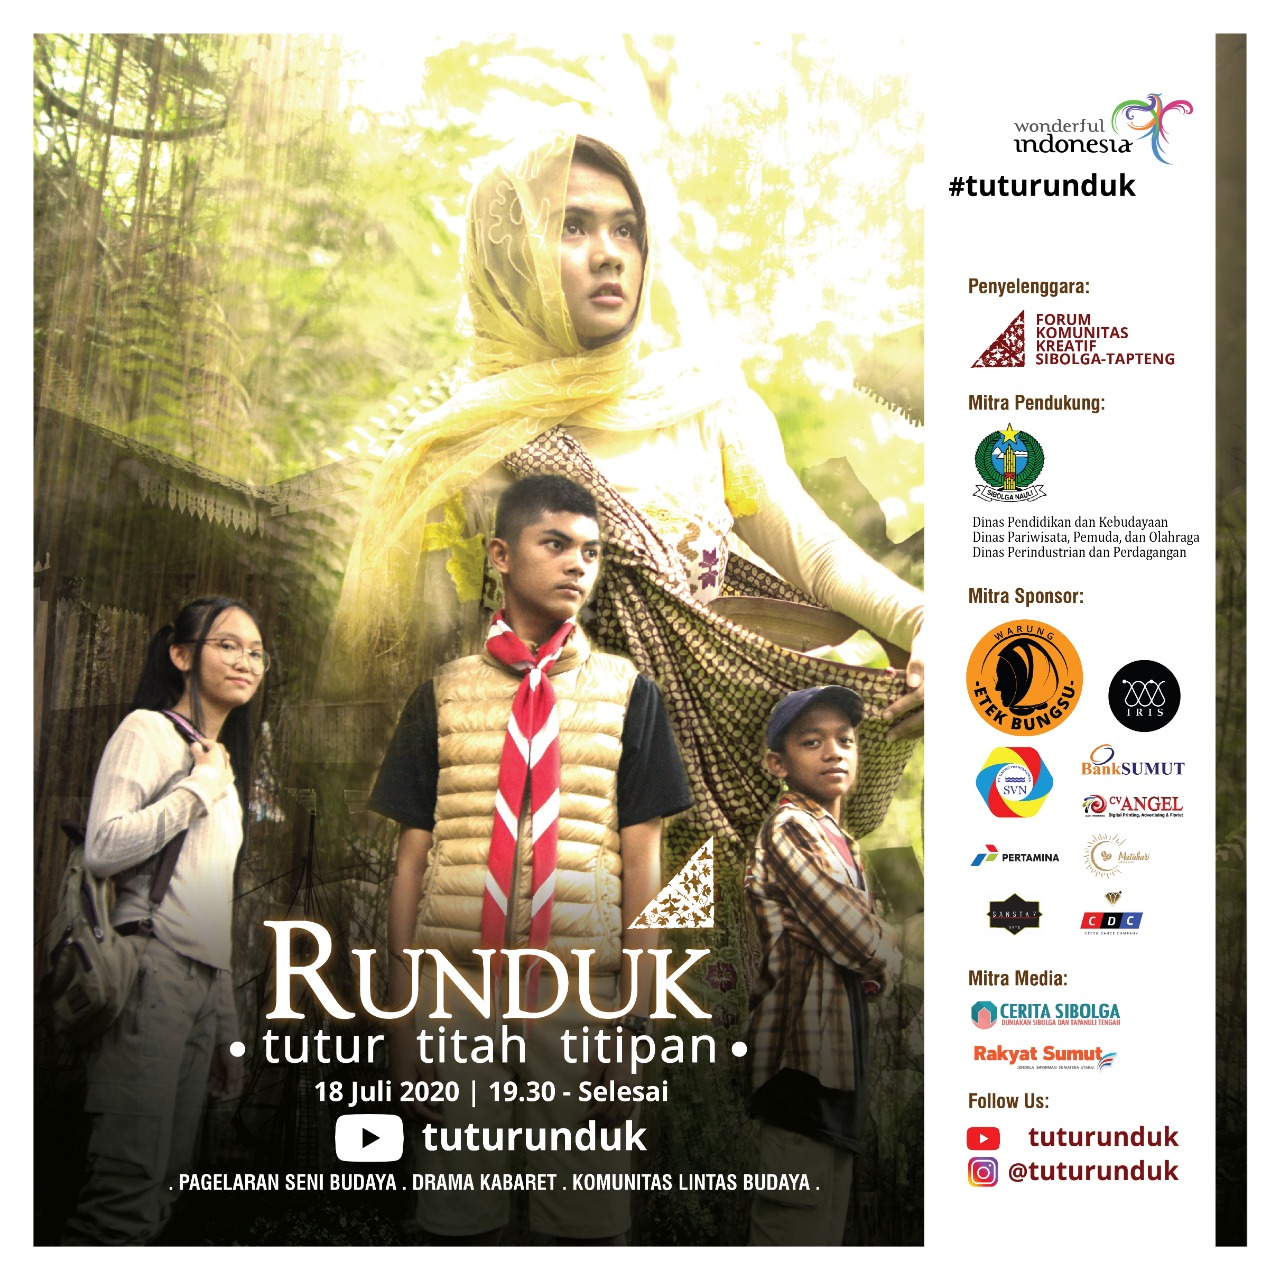 Flyer Pagelaran Drama Runduk Tutur Titah Titipan. Foto: Istimewa